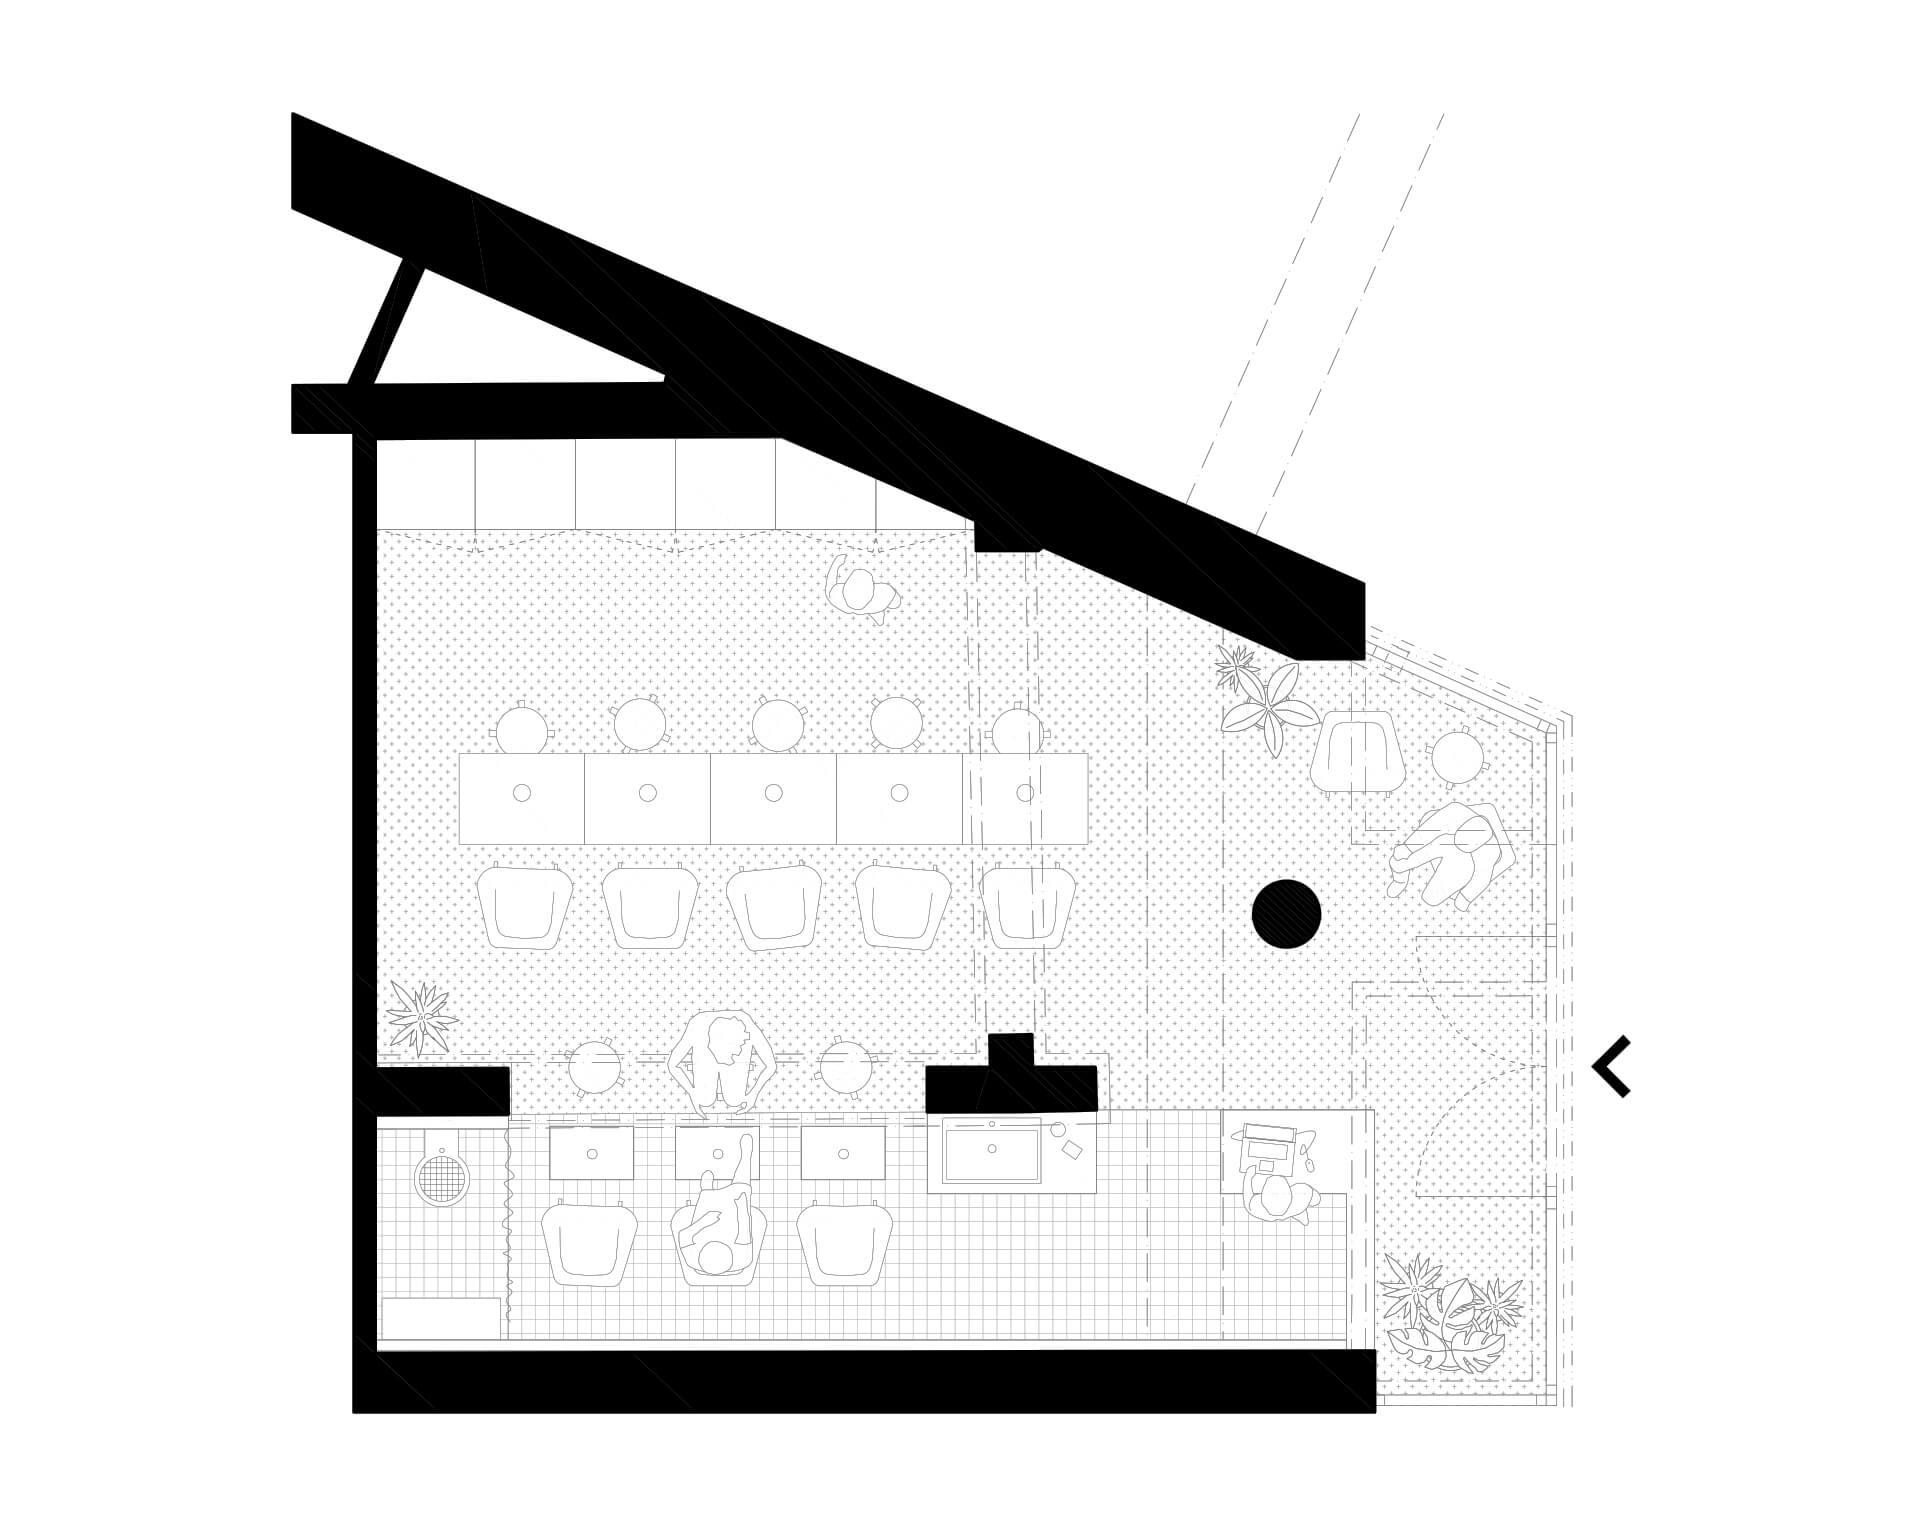 flamingo-nechtove-studio-interier_podorys